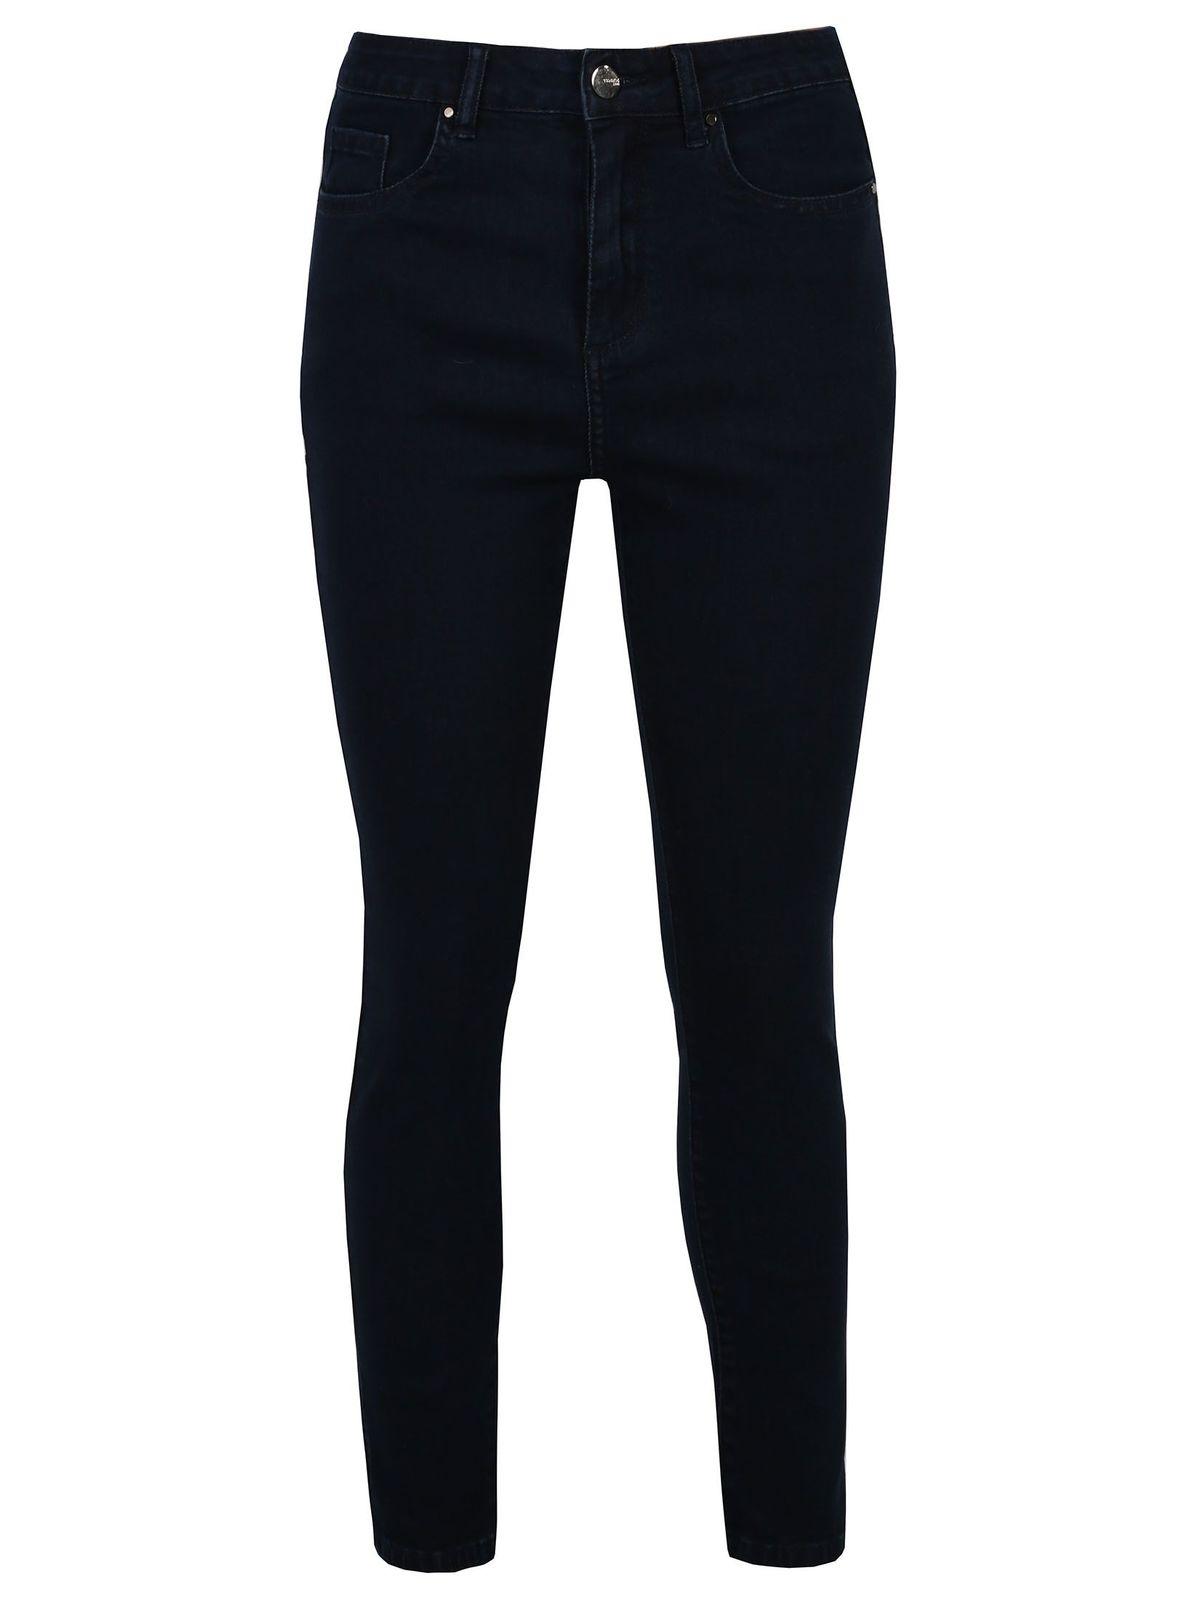 Pantaloni Top Secret S047902 DarkBlue